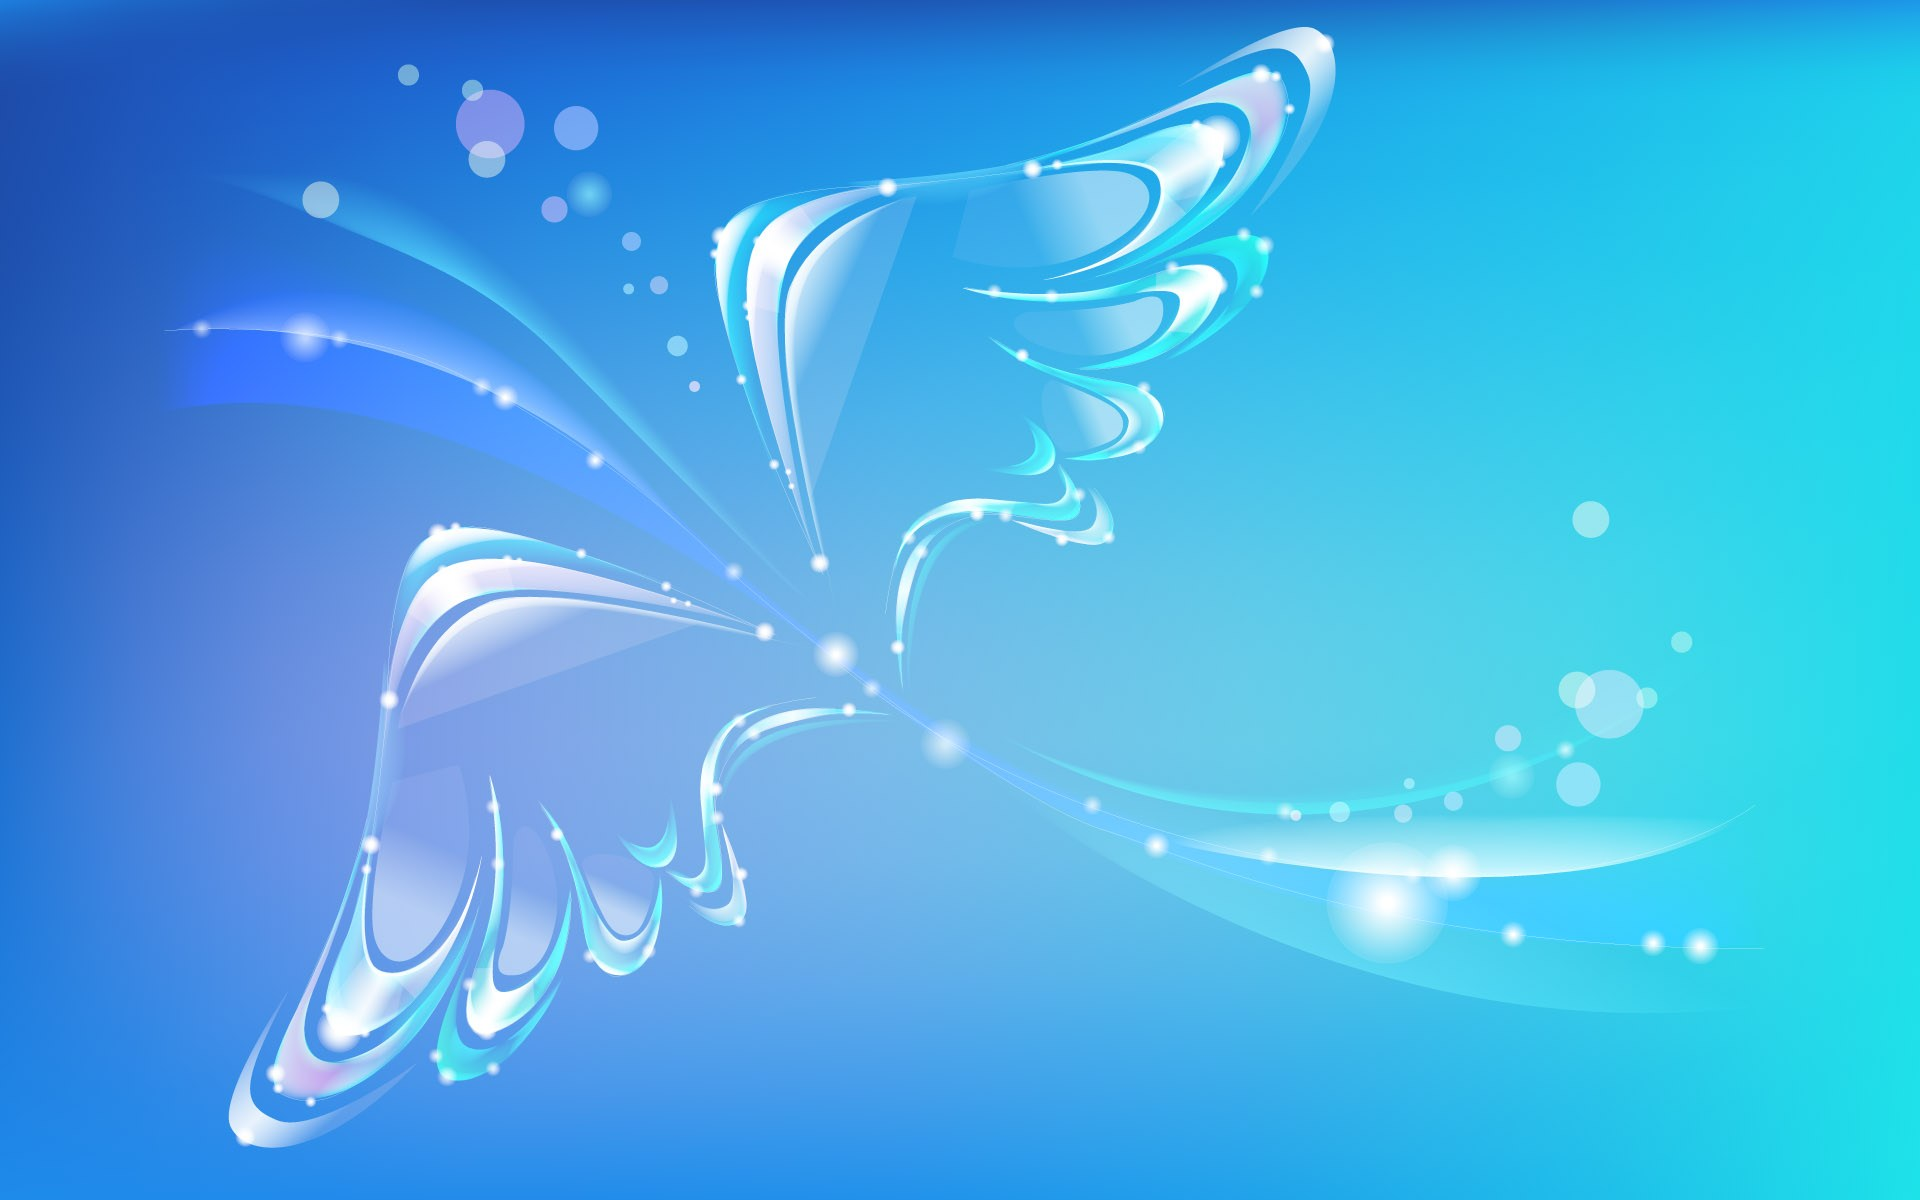 Clip Art Images Angel